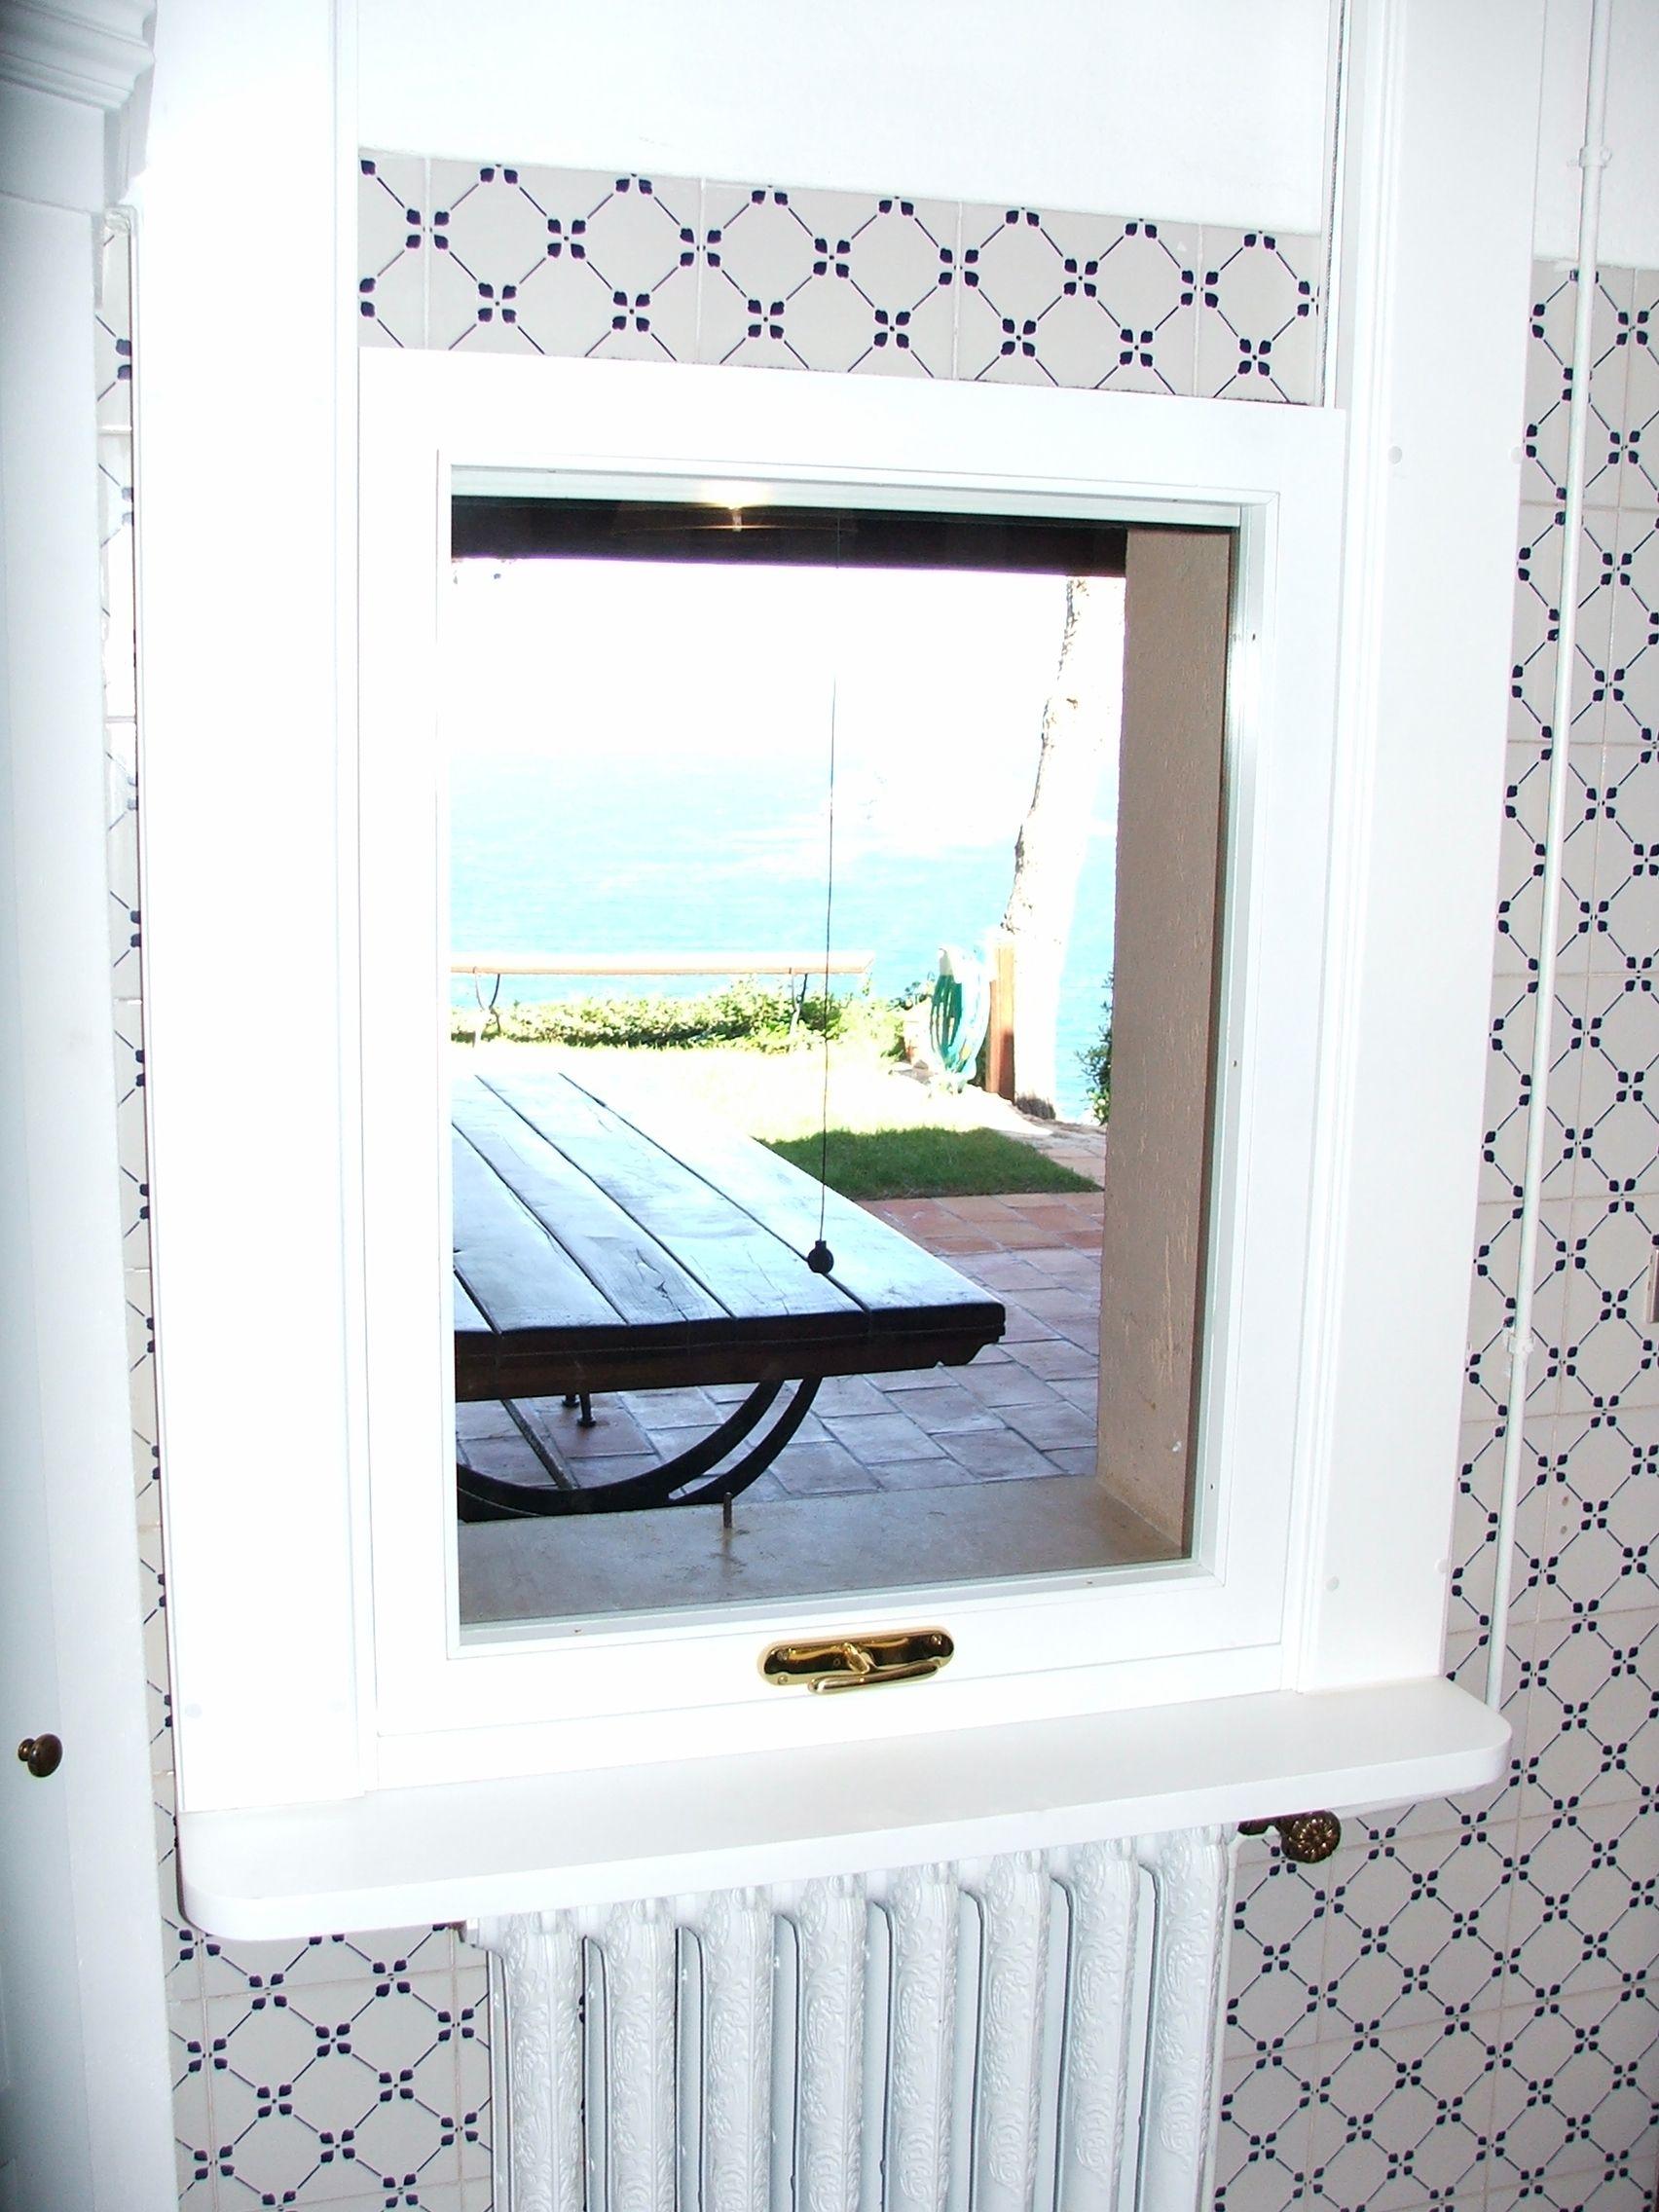 Finestra a ghigliottina infissi artigianali home decor for Falegnameria trentini